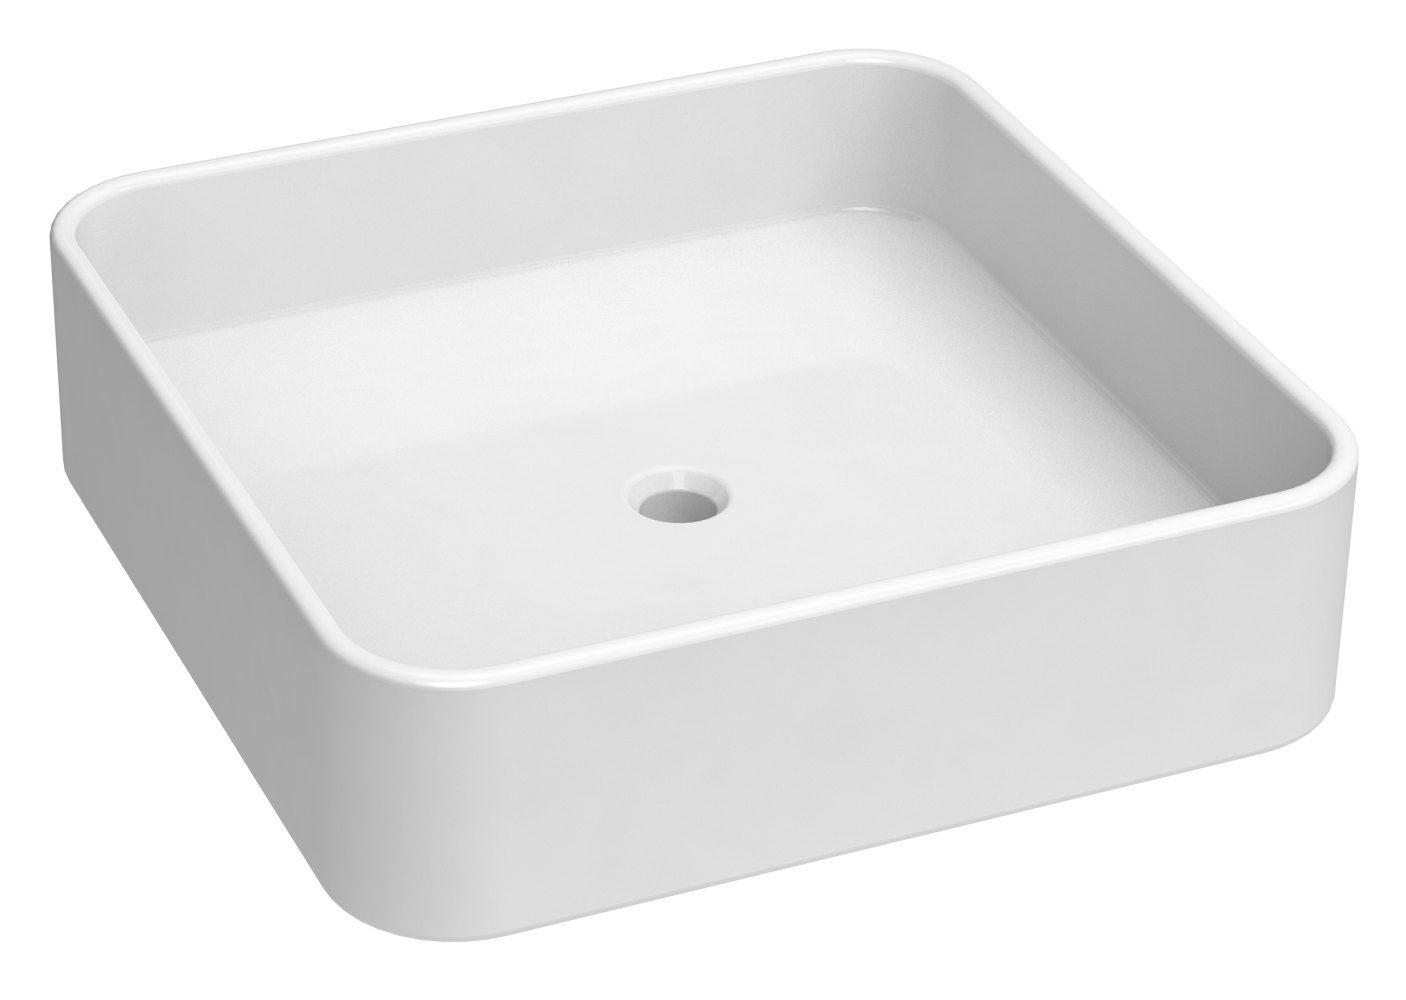 Bad - Waschbecken Dhule 27, Farbe: Weiß – 11 x 40 x 40 cm (H x B x T)